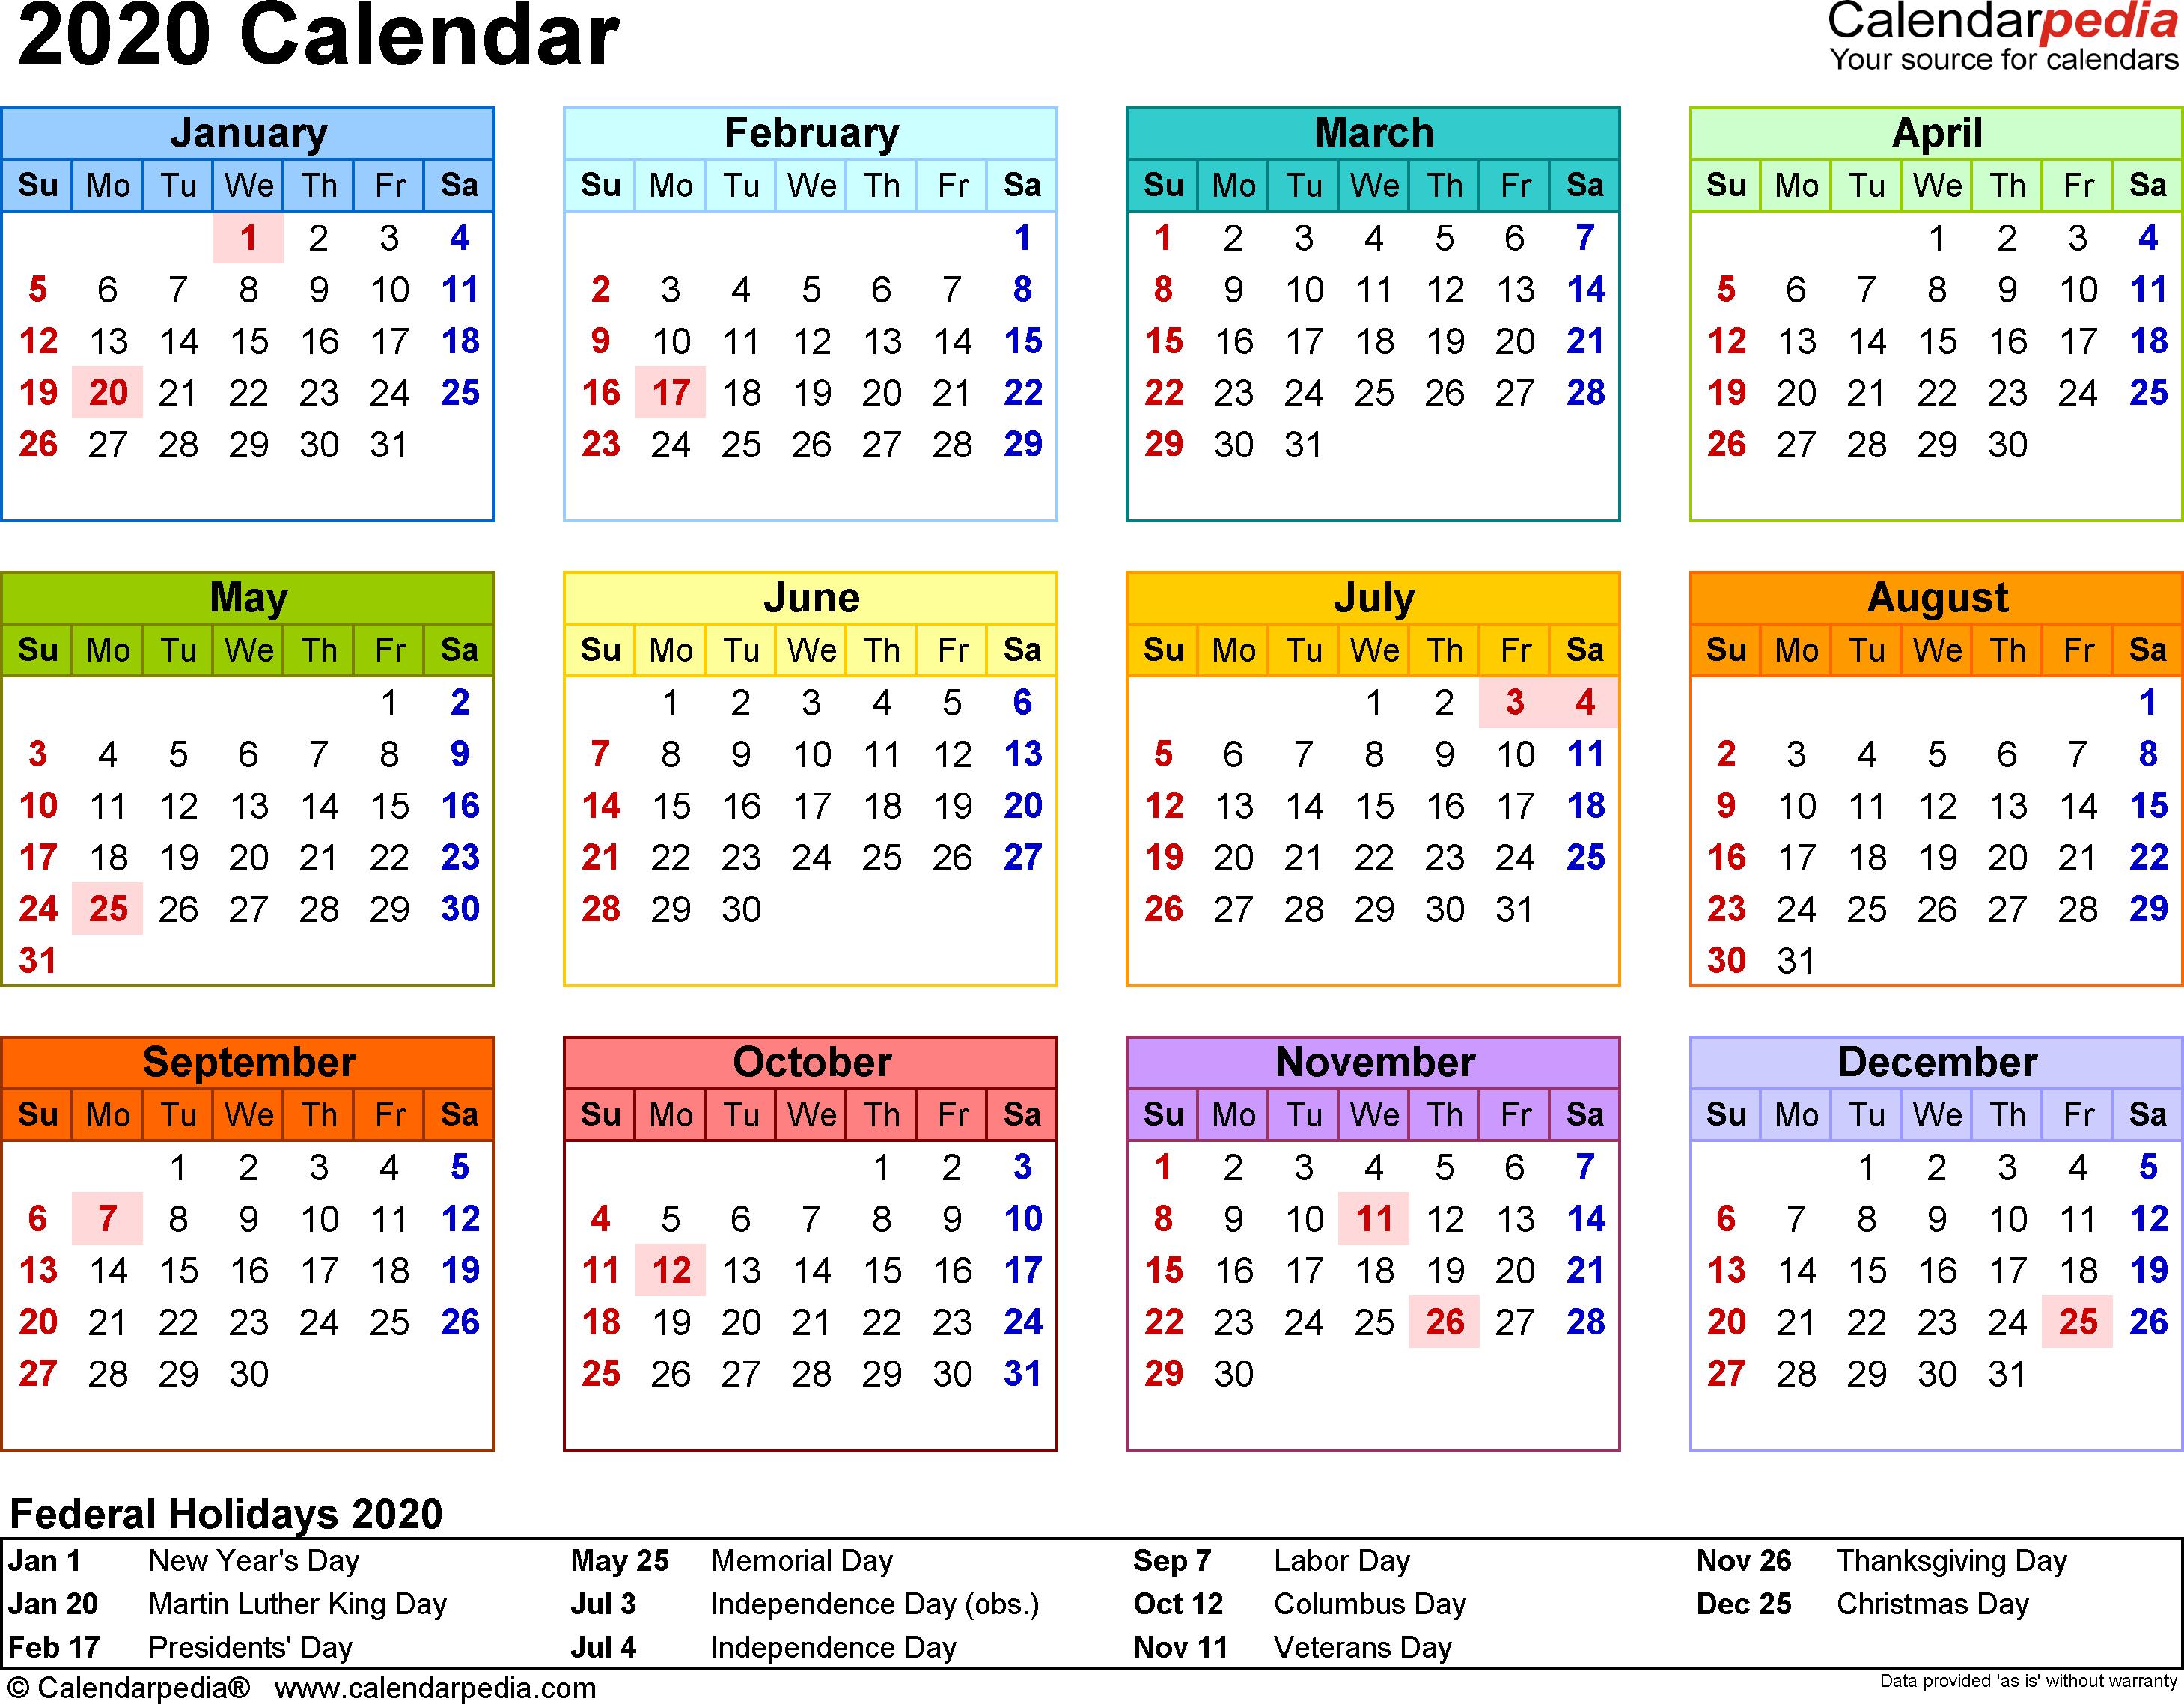 2020 Calendar - 17 Free Printable Word Calendar Templates throughout 2020 Free Printable Emploee Calendars